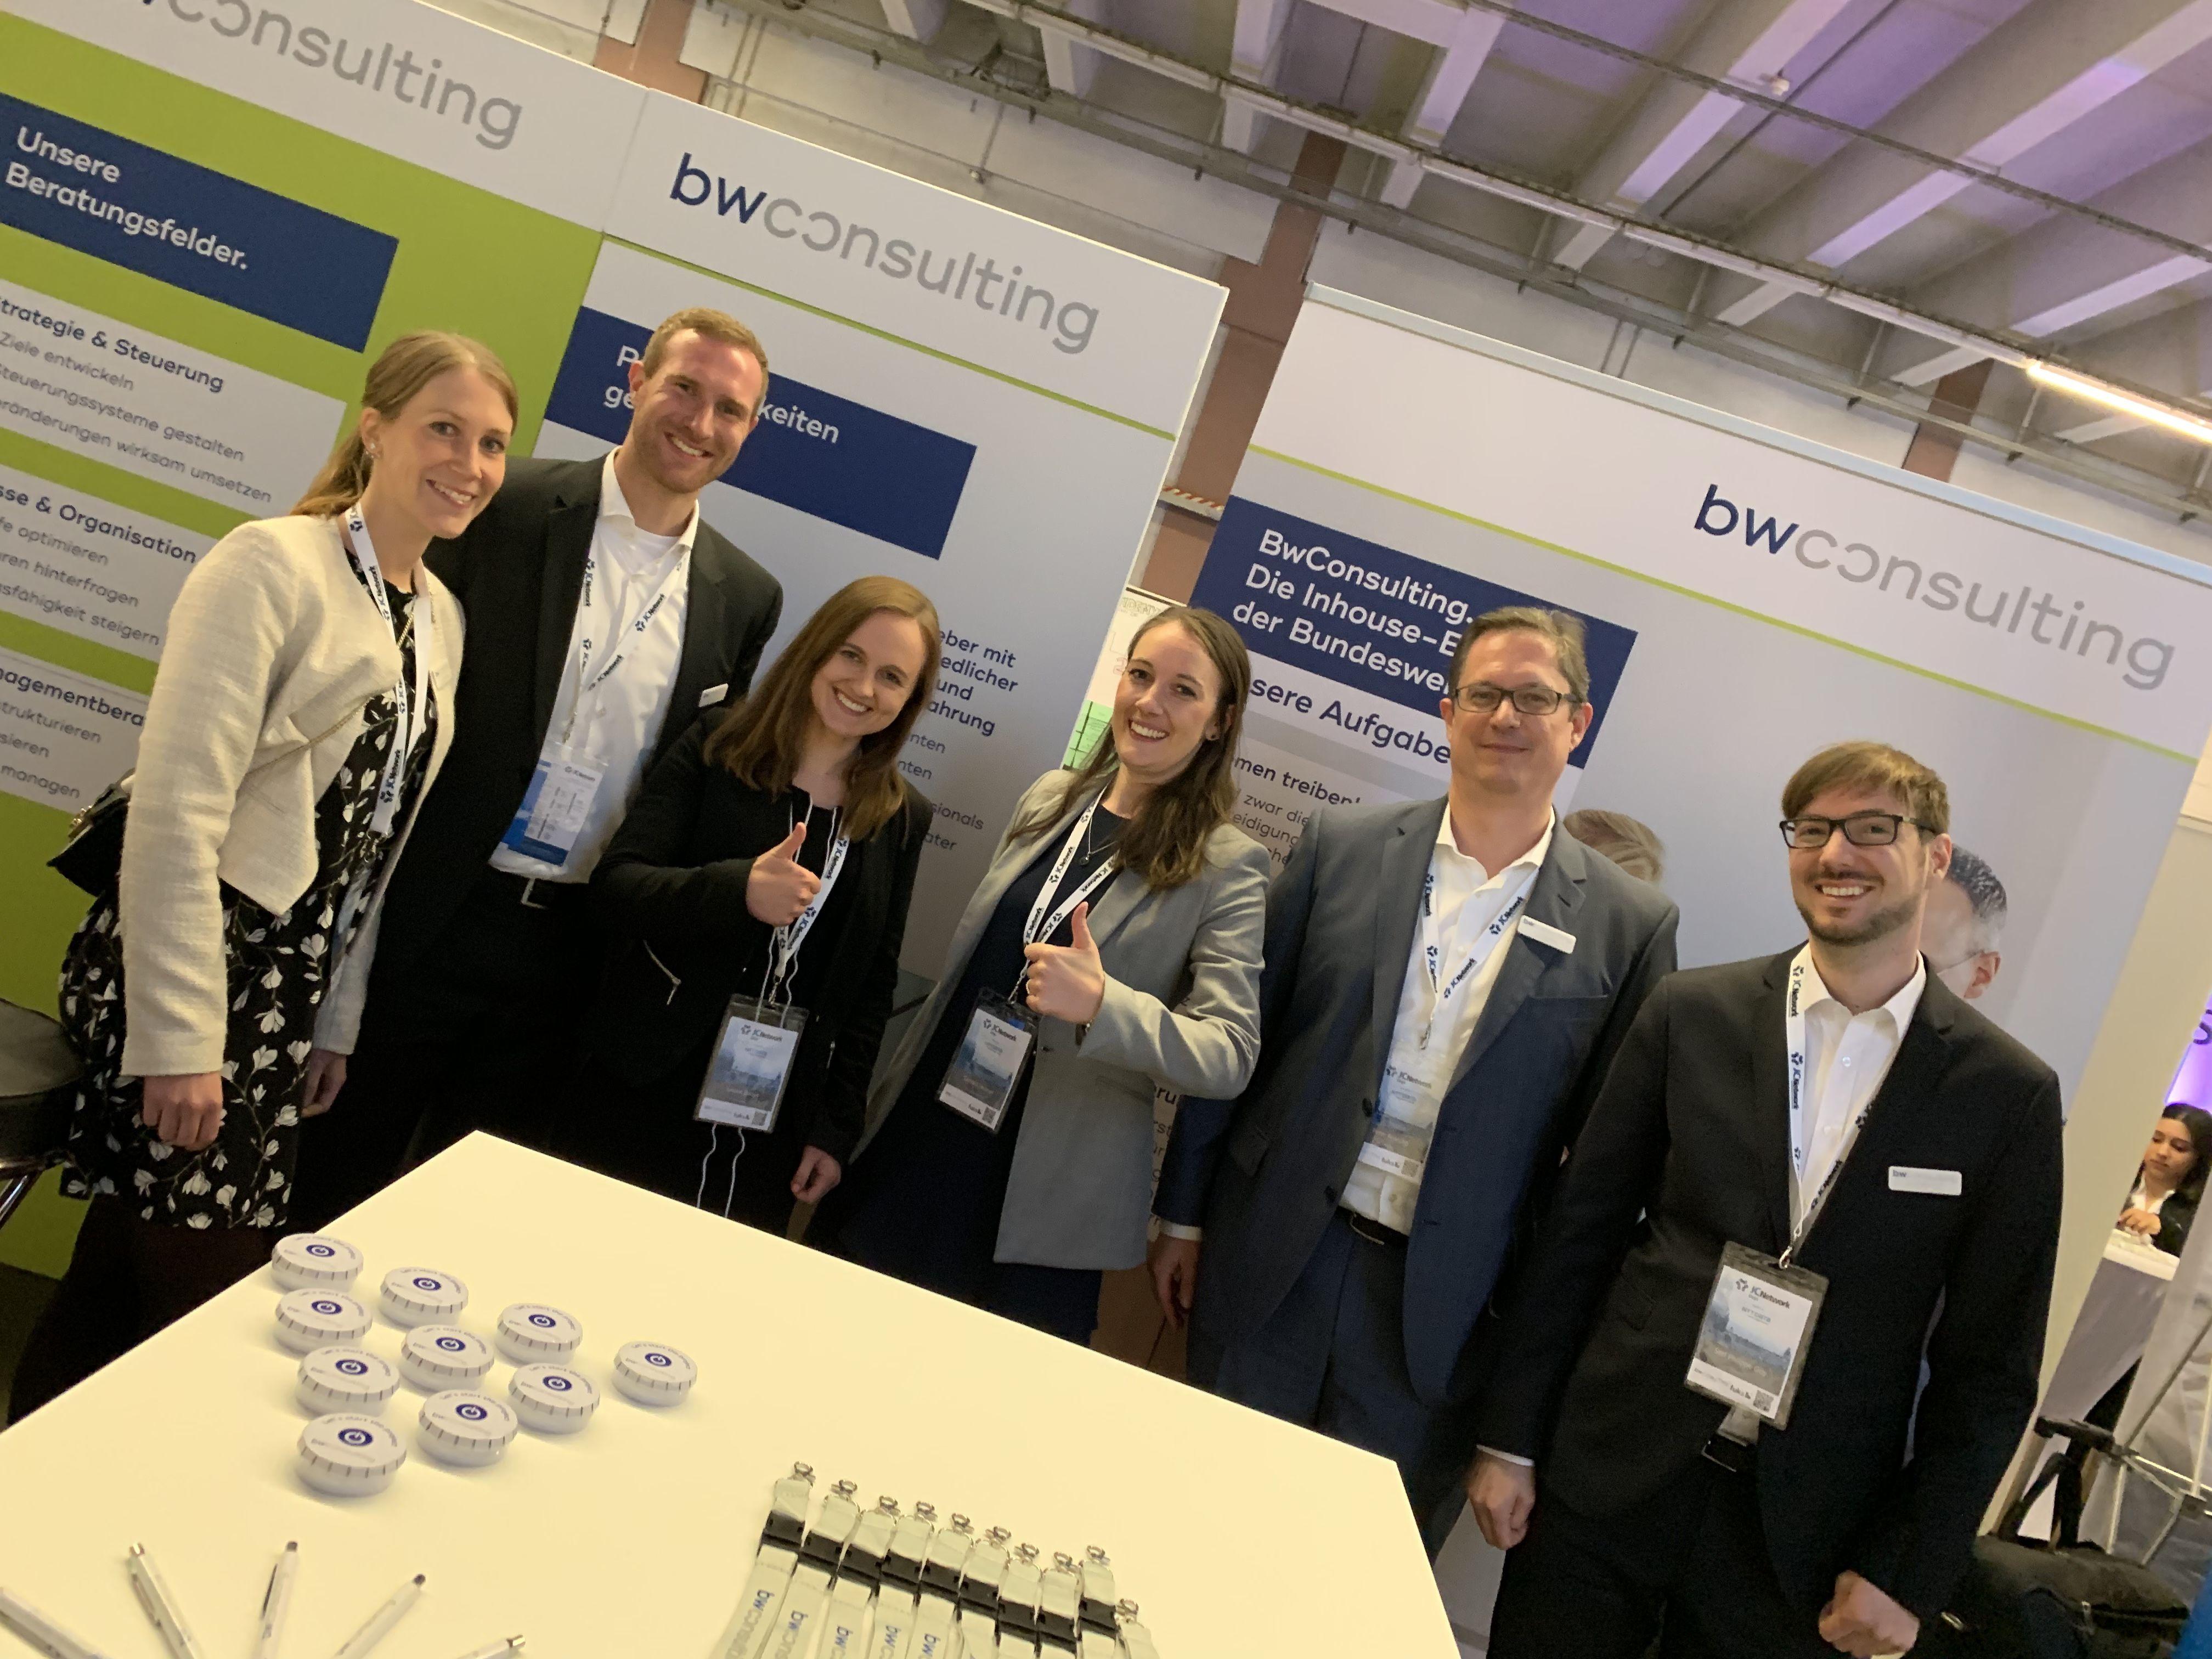 Das Team der BwConsulting: Anna Müller, Henning Seehusen, Juliane Berres, Tamara Lindner, Peter Brüning, Guy Serf (v.l.)